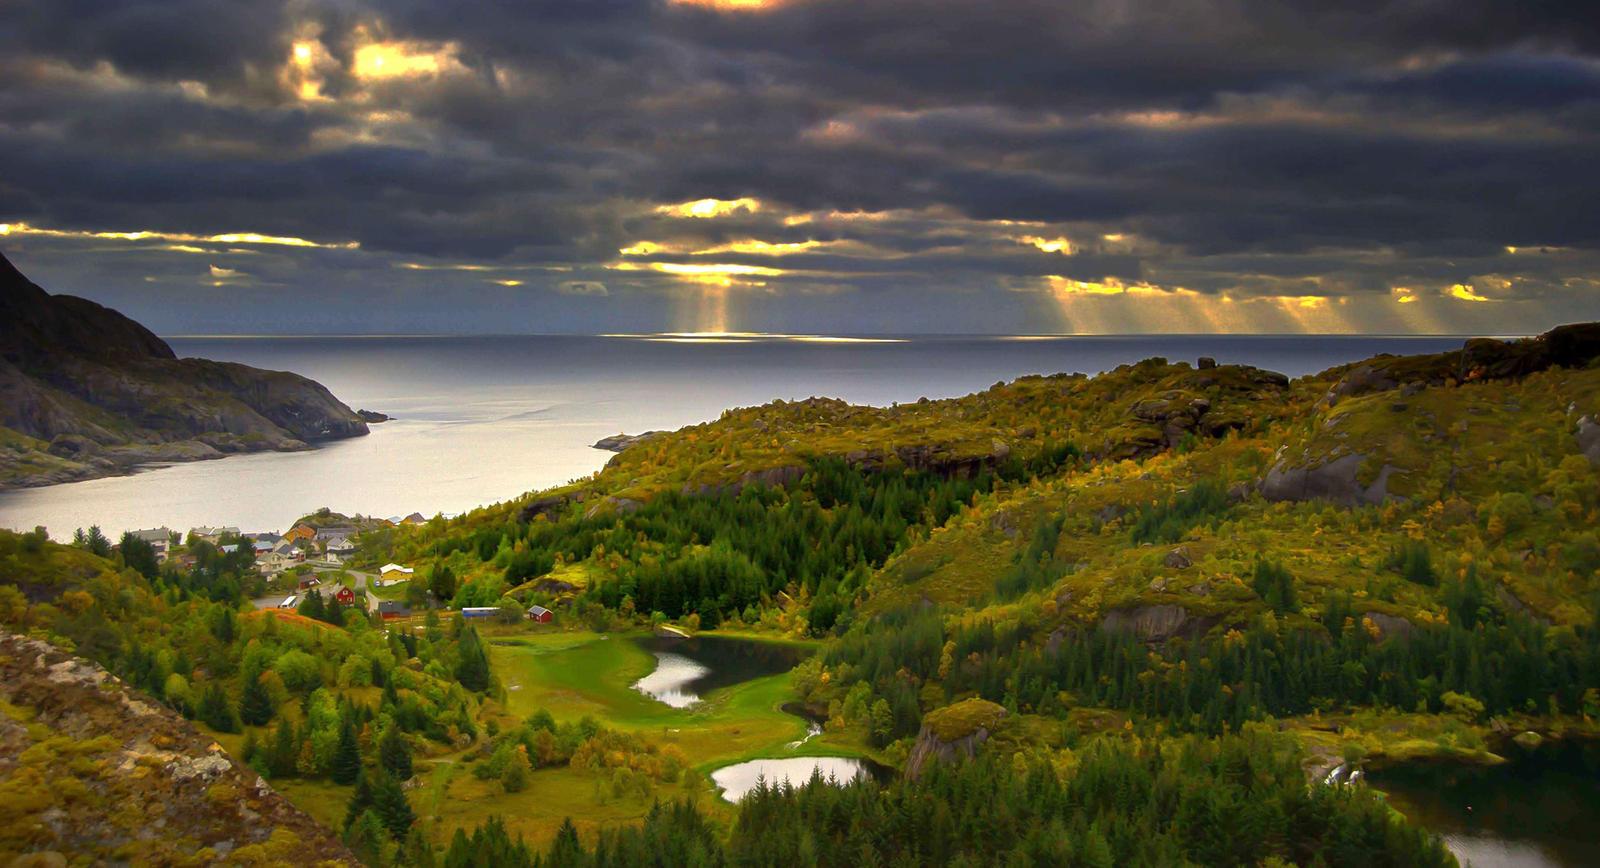 Autumn in Nusfjord by steinliland